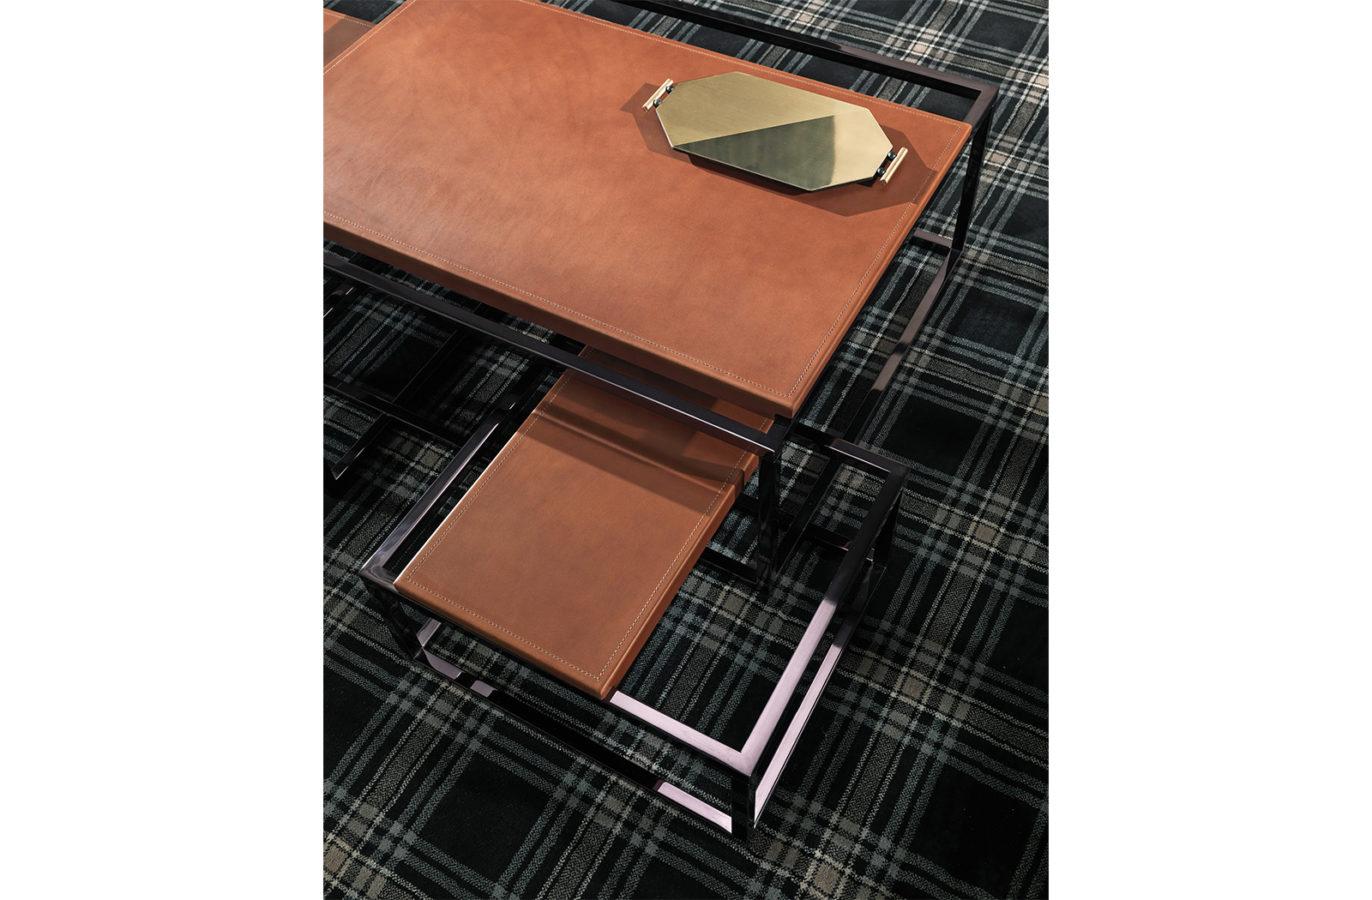 Gianfranco Ferre Home Matrix Central Table 04